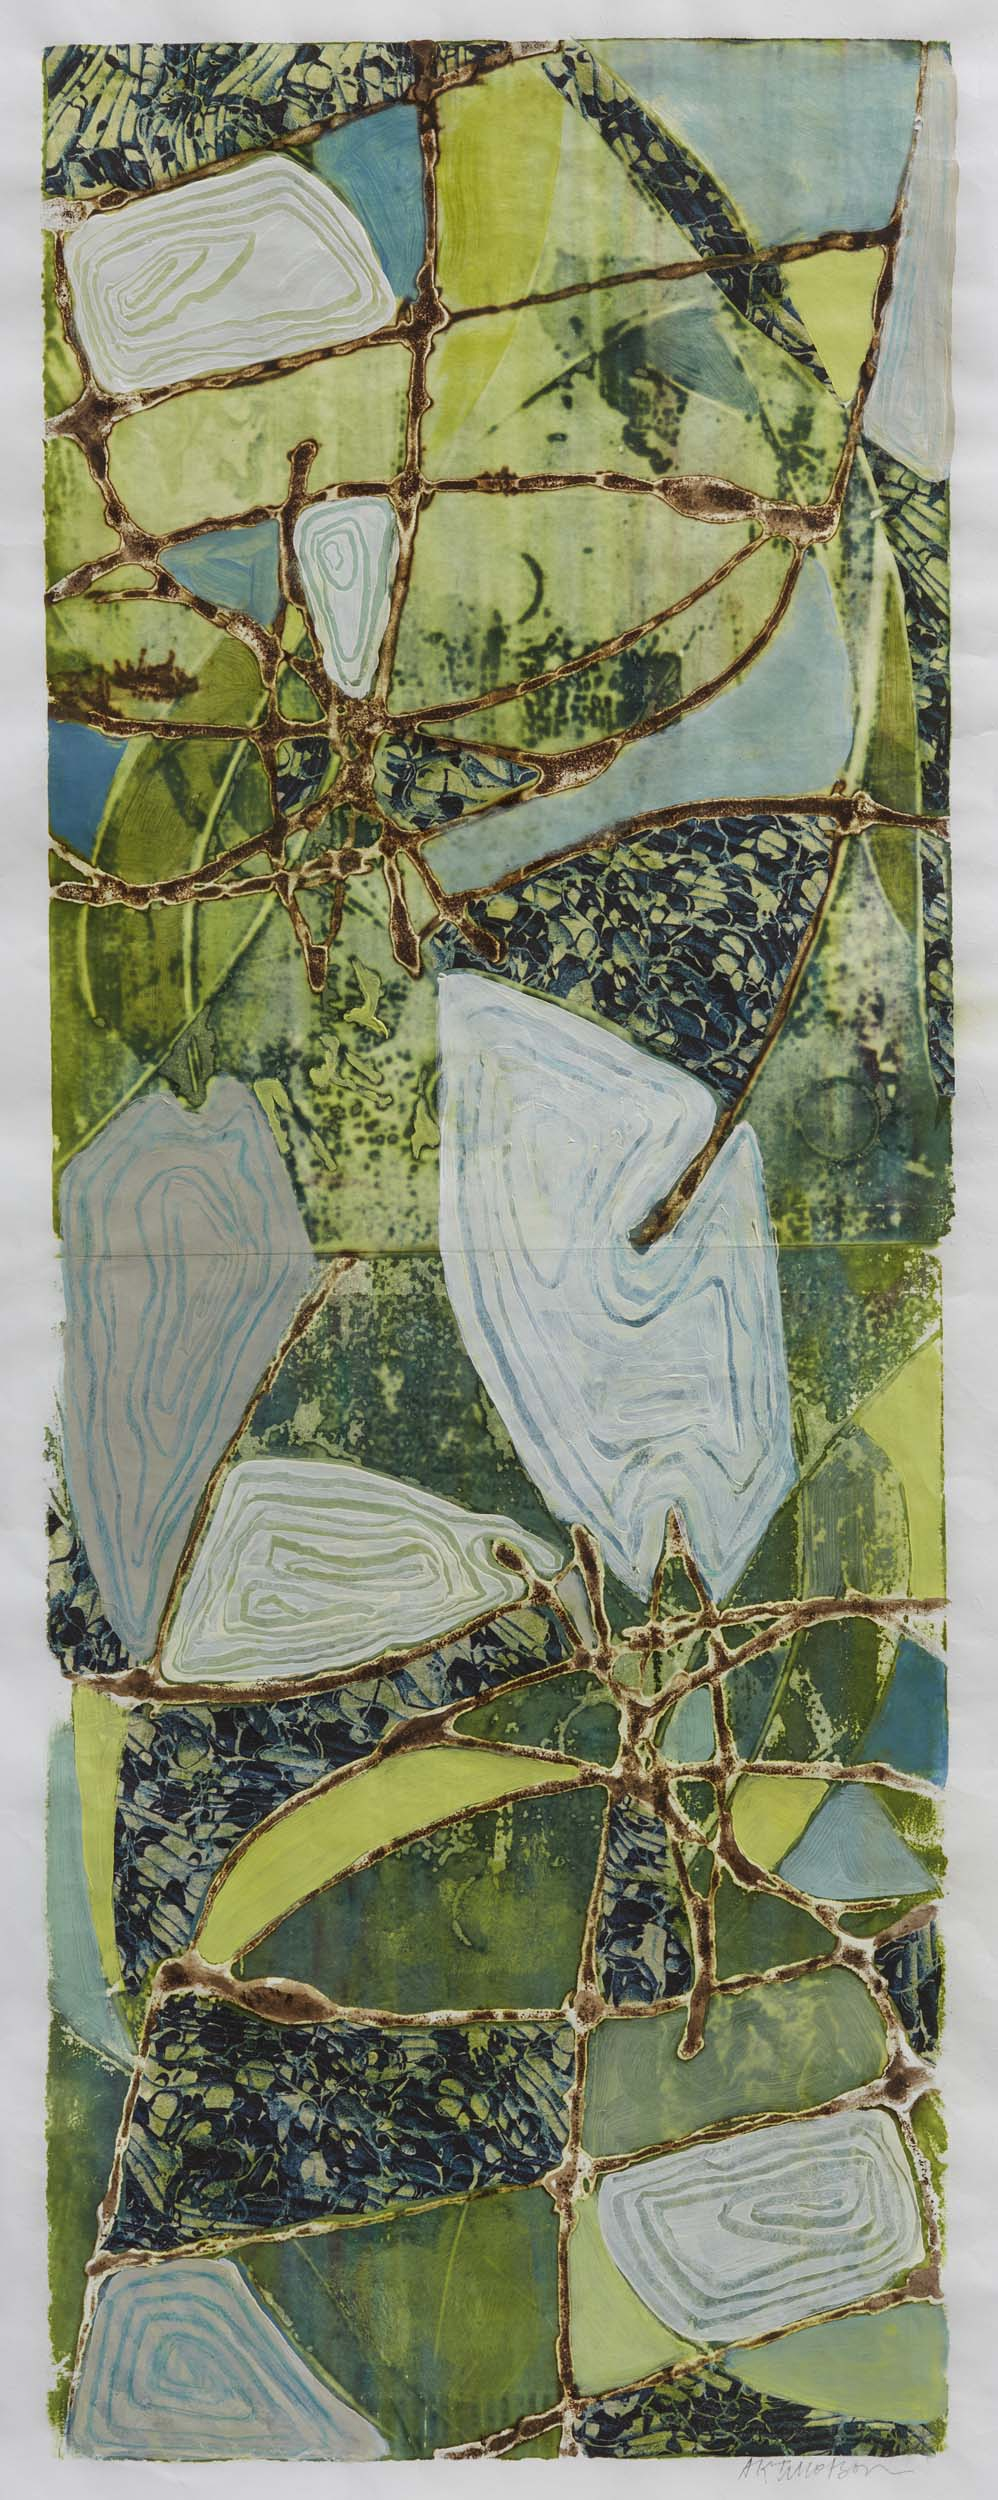 Verdant Fields by St. Paul, MN multimedia artist, Amy Tillotson